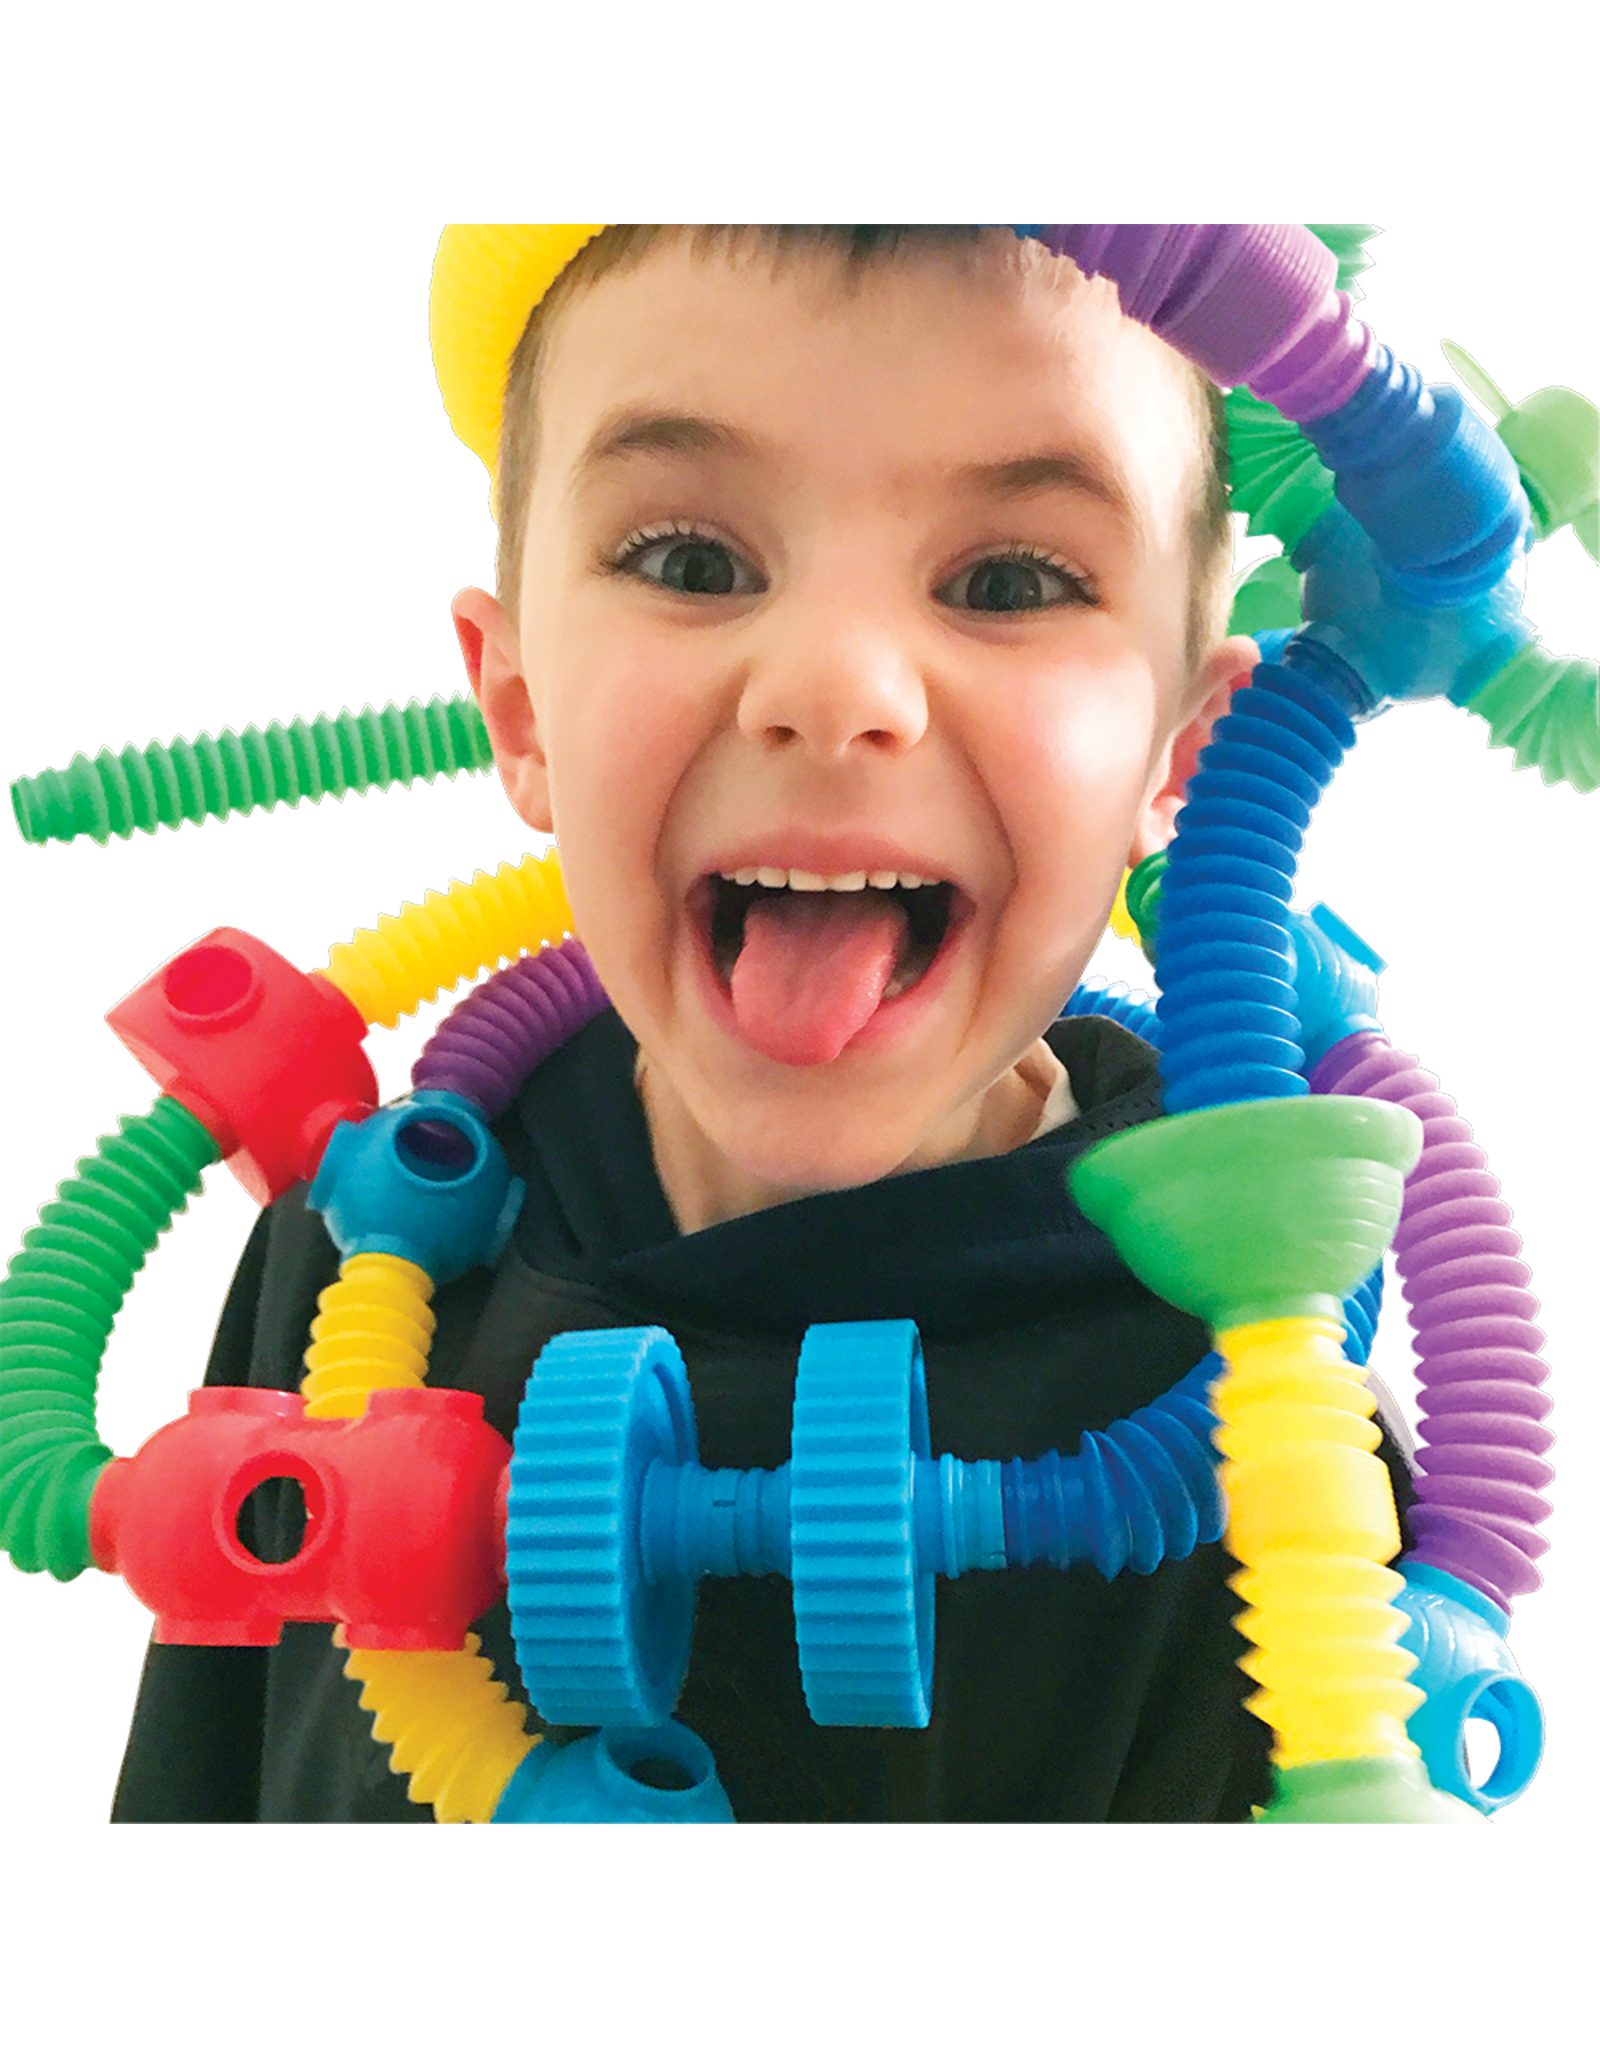 Romper Room Popoids 30pc Building Toy